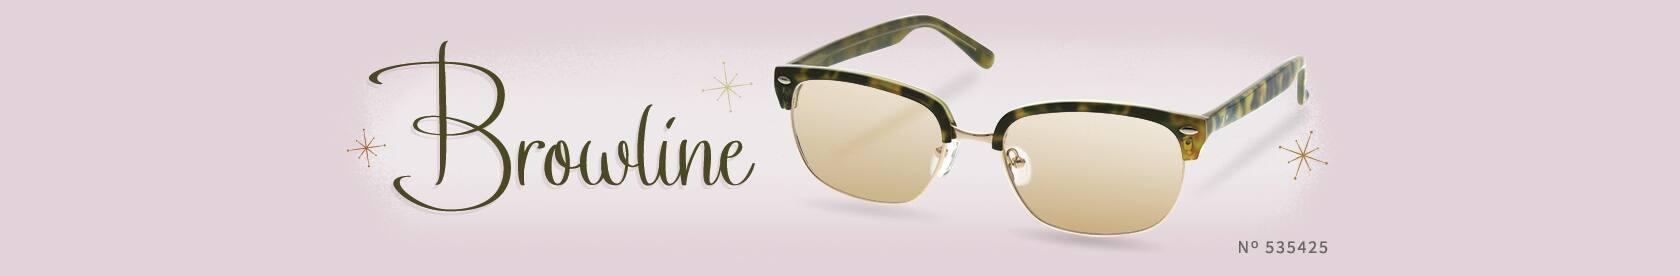 Browline Glasses Zenni Optical : Browline Style Browline Glasses Zenni Optical